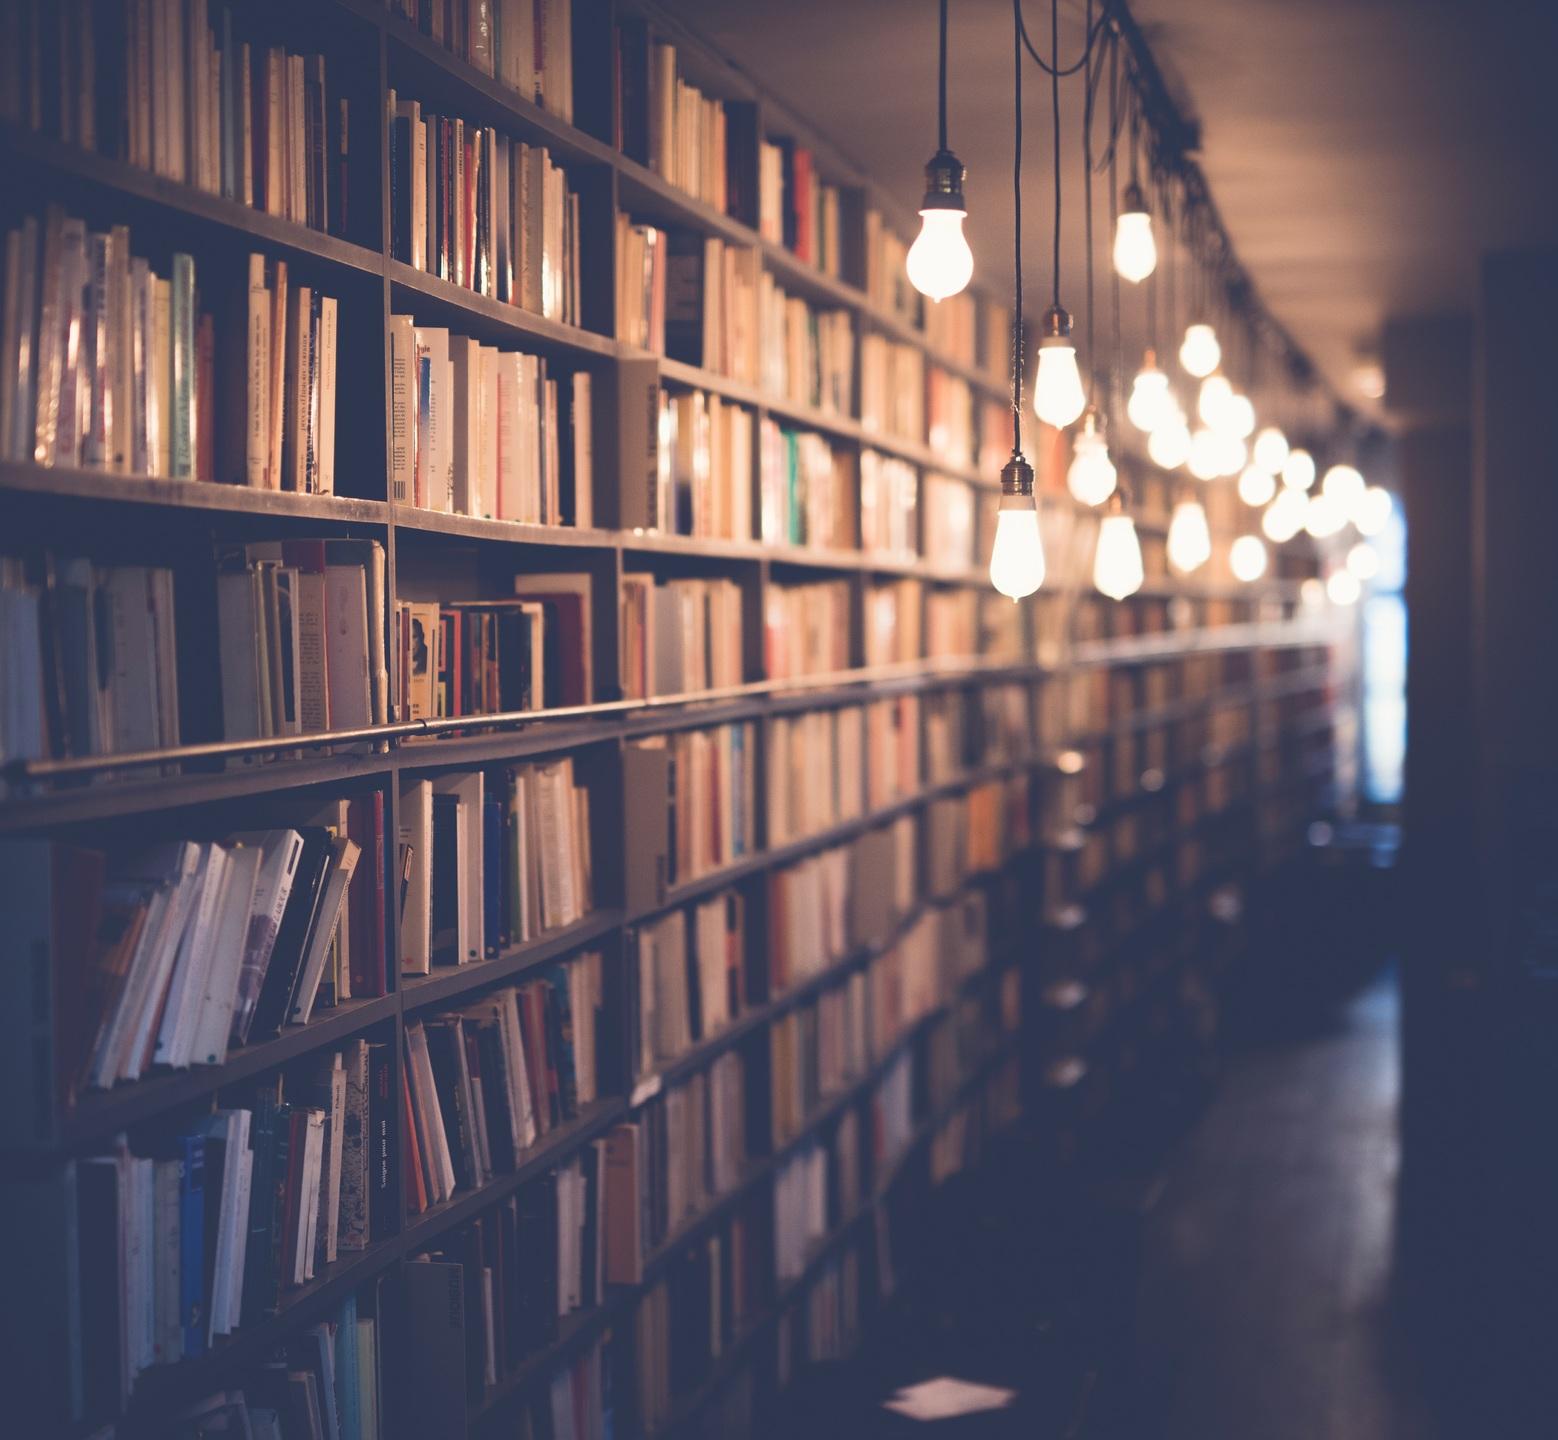 book-light-night-sunlight-line-reflection-96401-pxhere.com.jpg